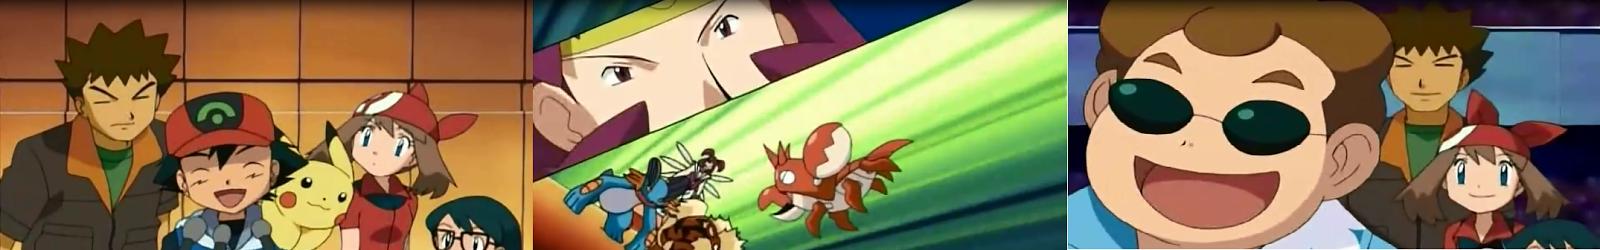 Pokemon Capitulo 8 Temporada 9 Tácticas Teatrales